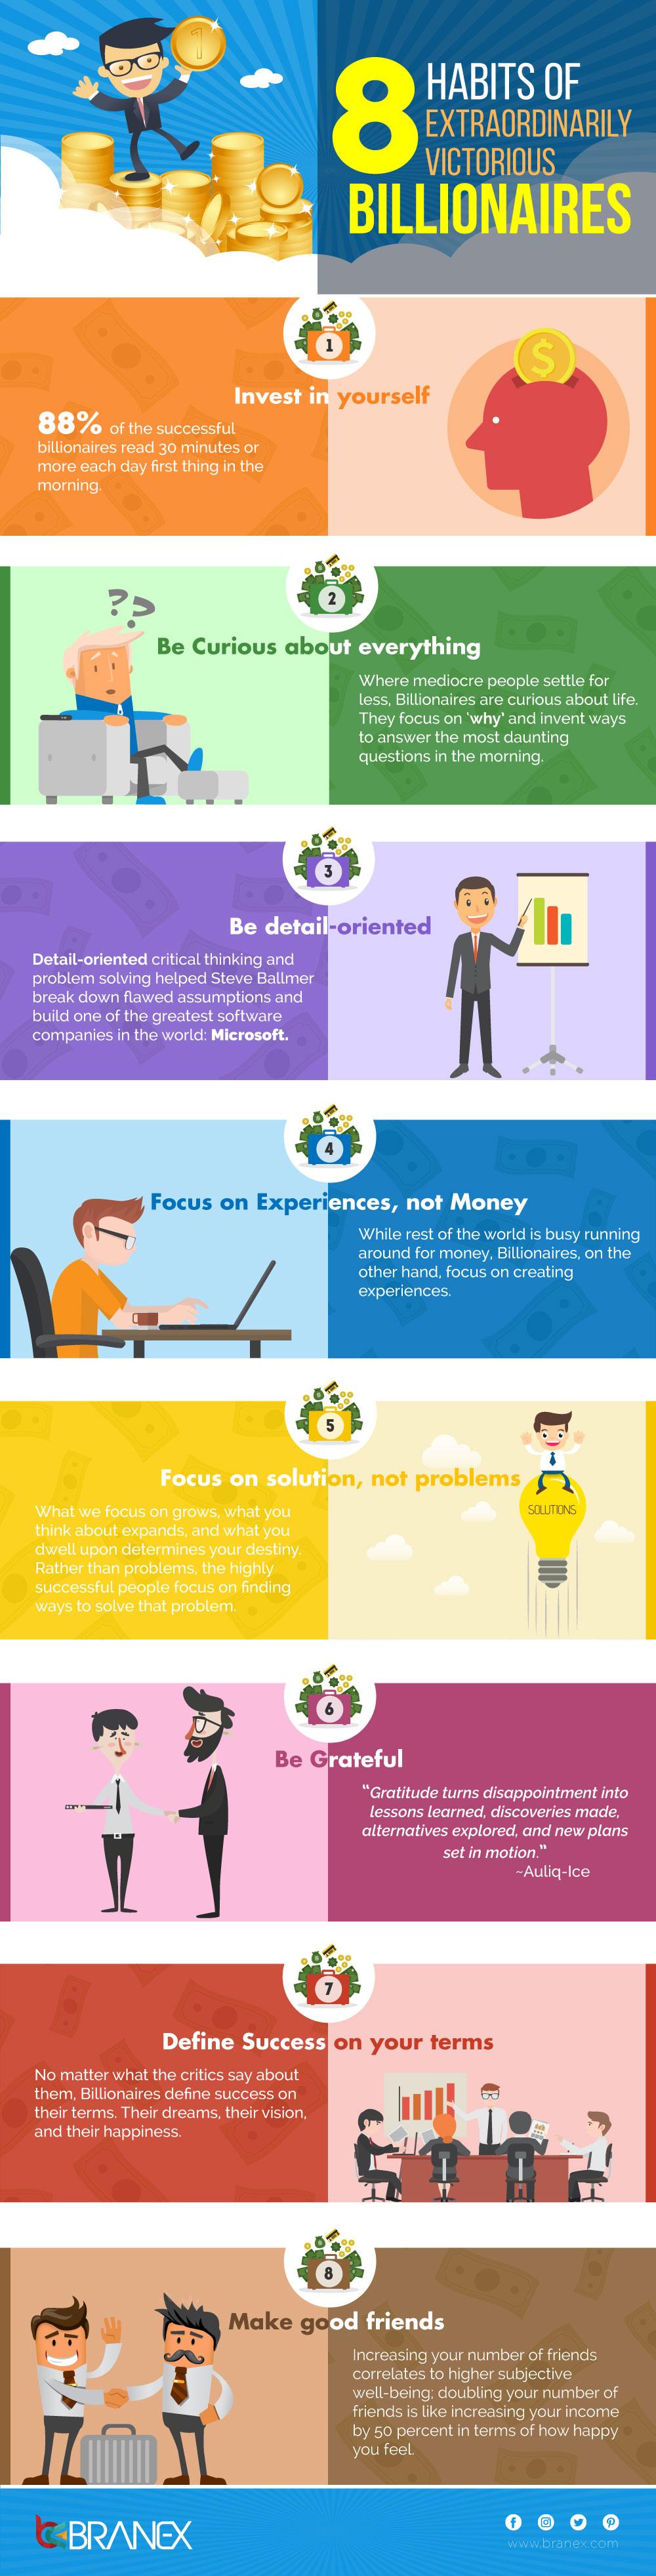 8 Billionaire Habits Worth Emulating - Infographic